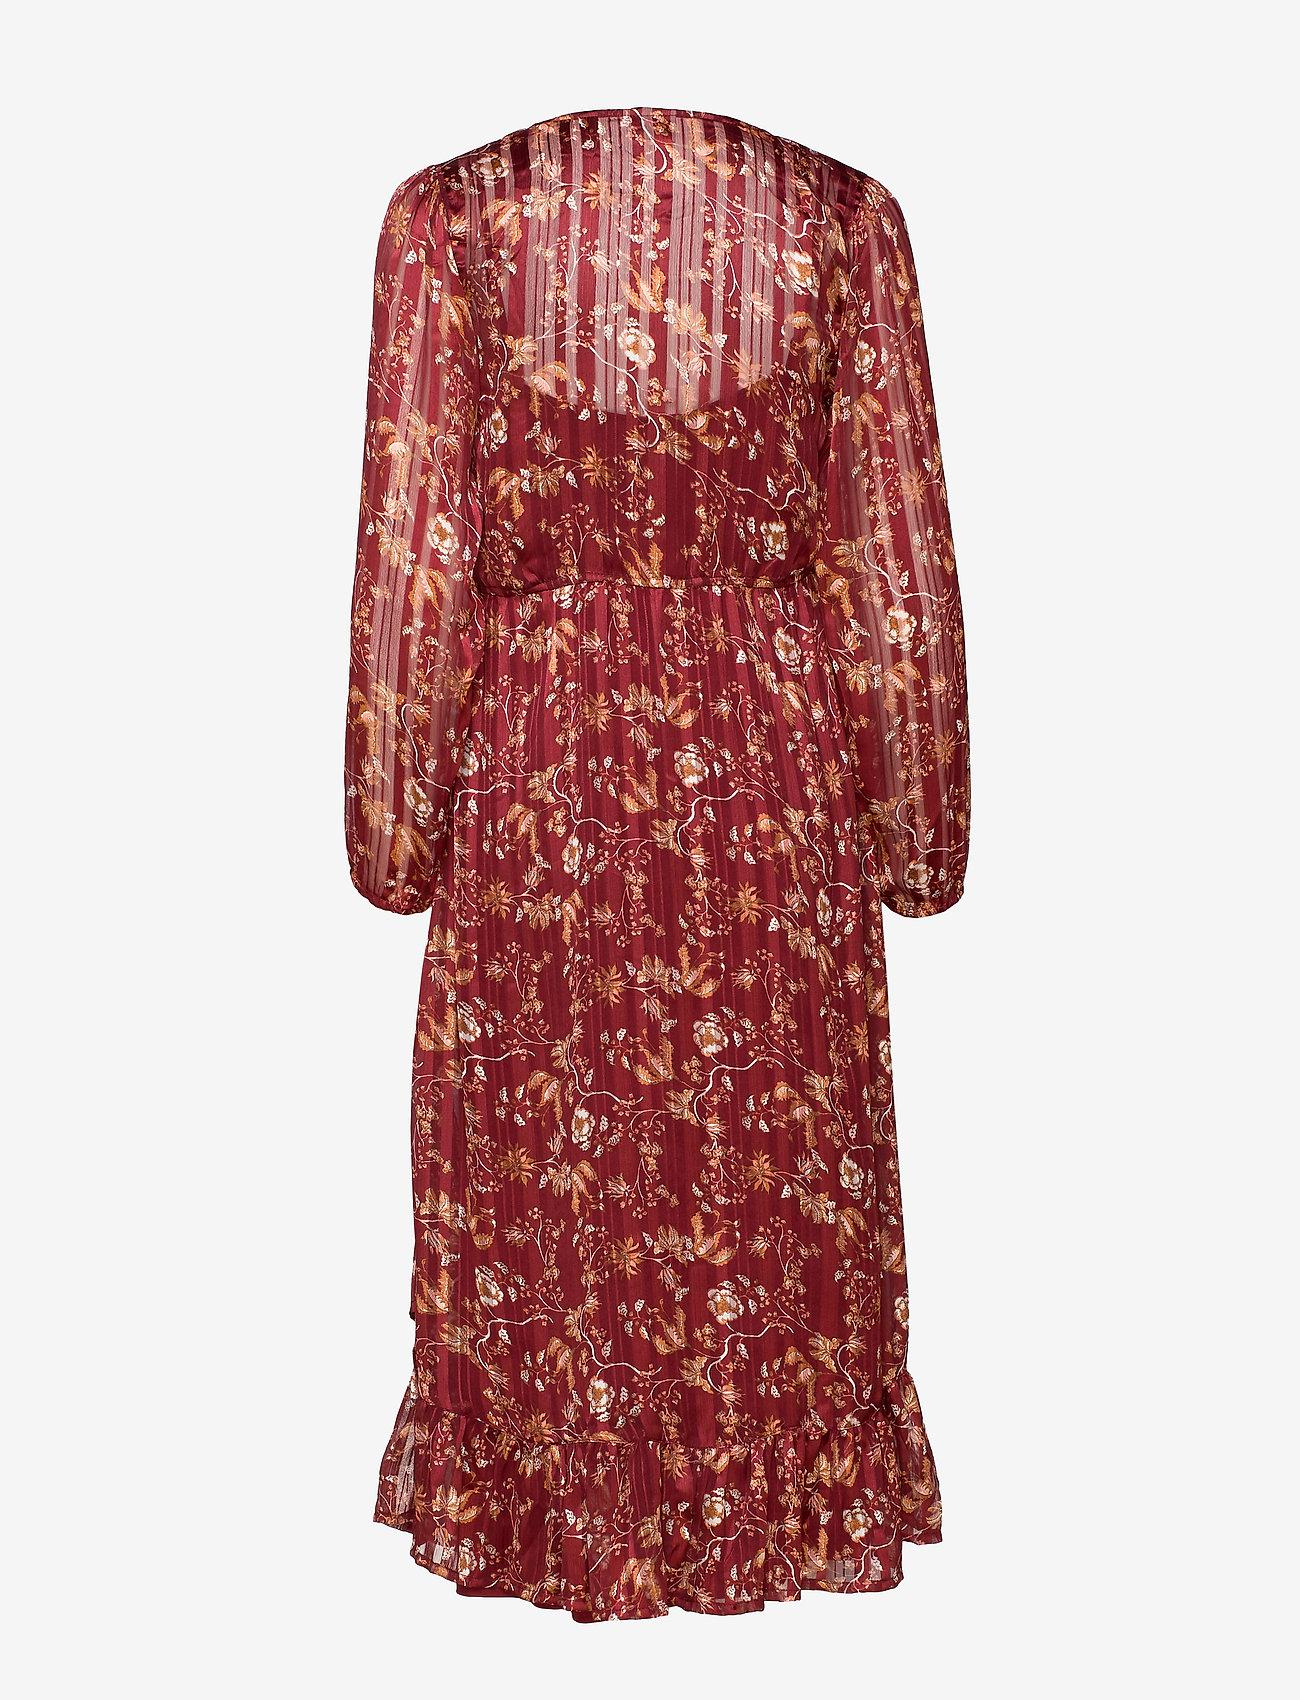 Nila Wrap Dress (Merlot Red) (49.98 €) - Cream tUApG